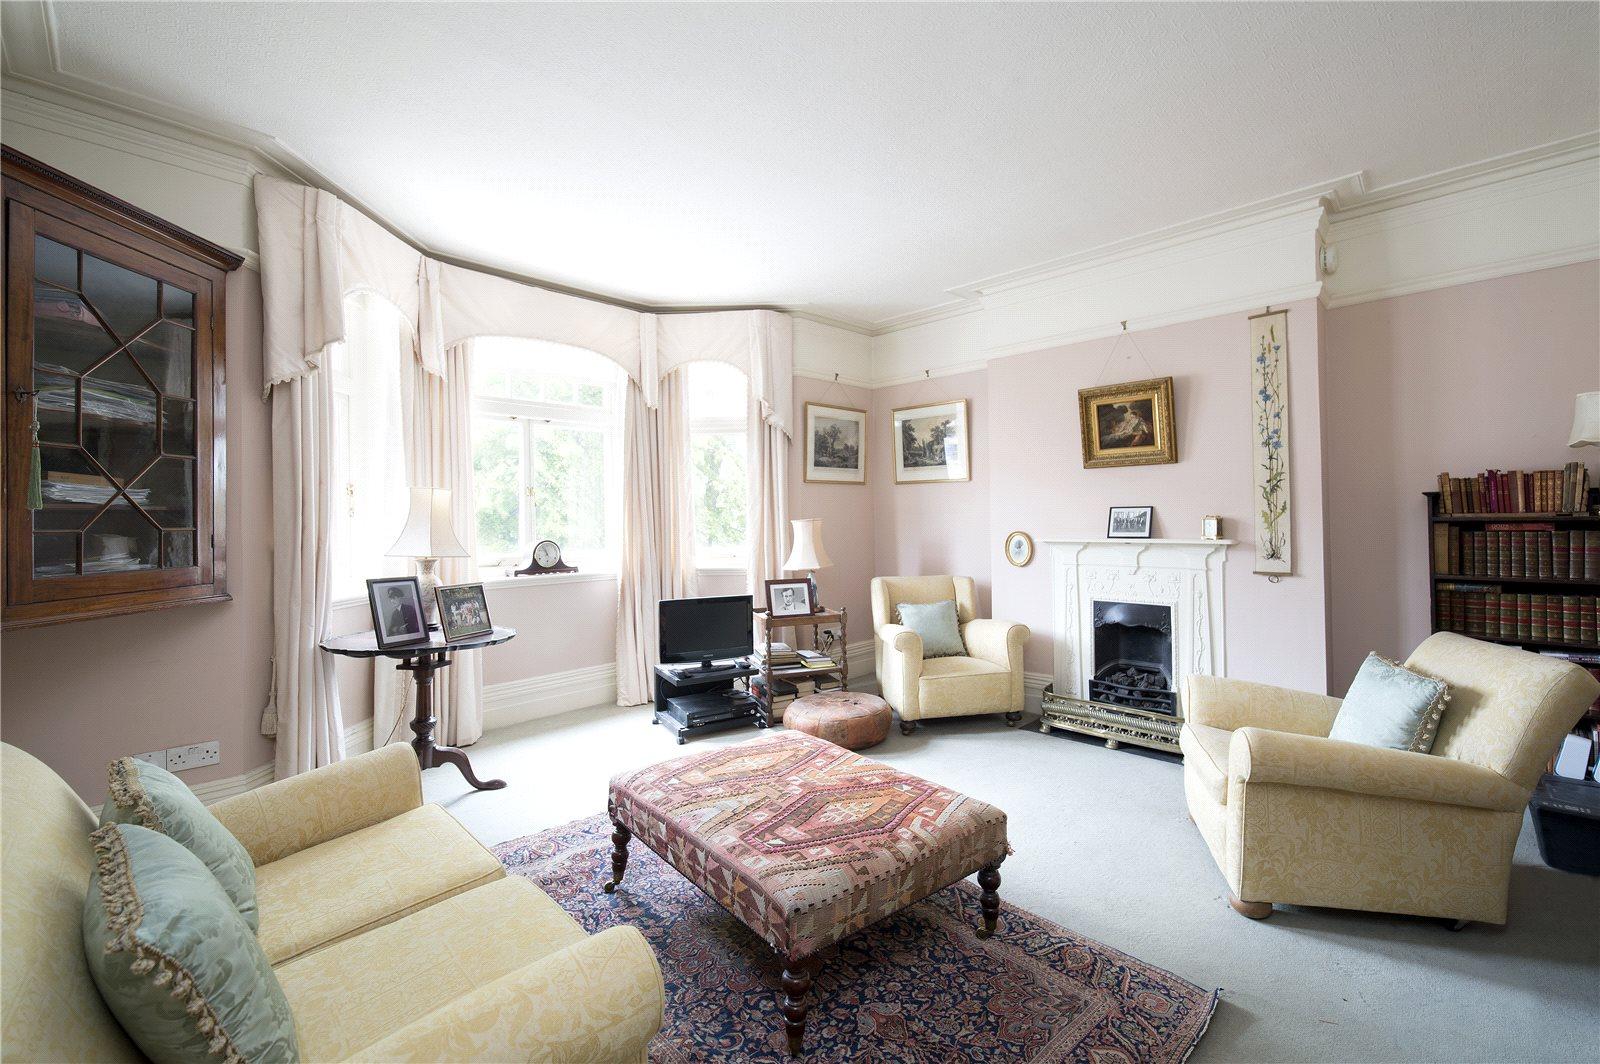 Additional photo for property listing at Hurlingham Court Mansions, Hurlingham Road, Fulham, London, SW6 Fulham, London, Angleterre